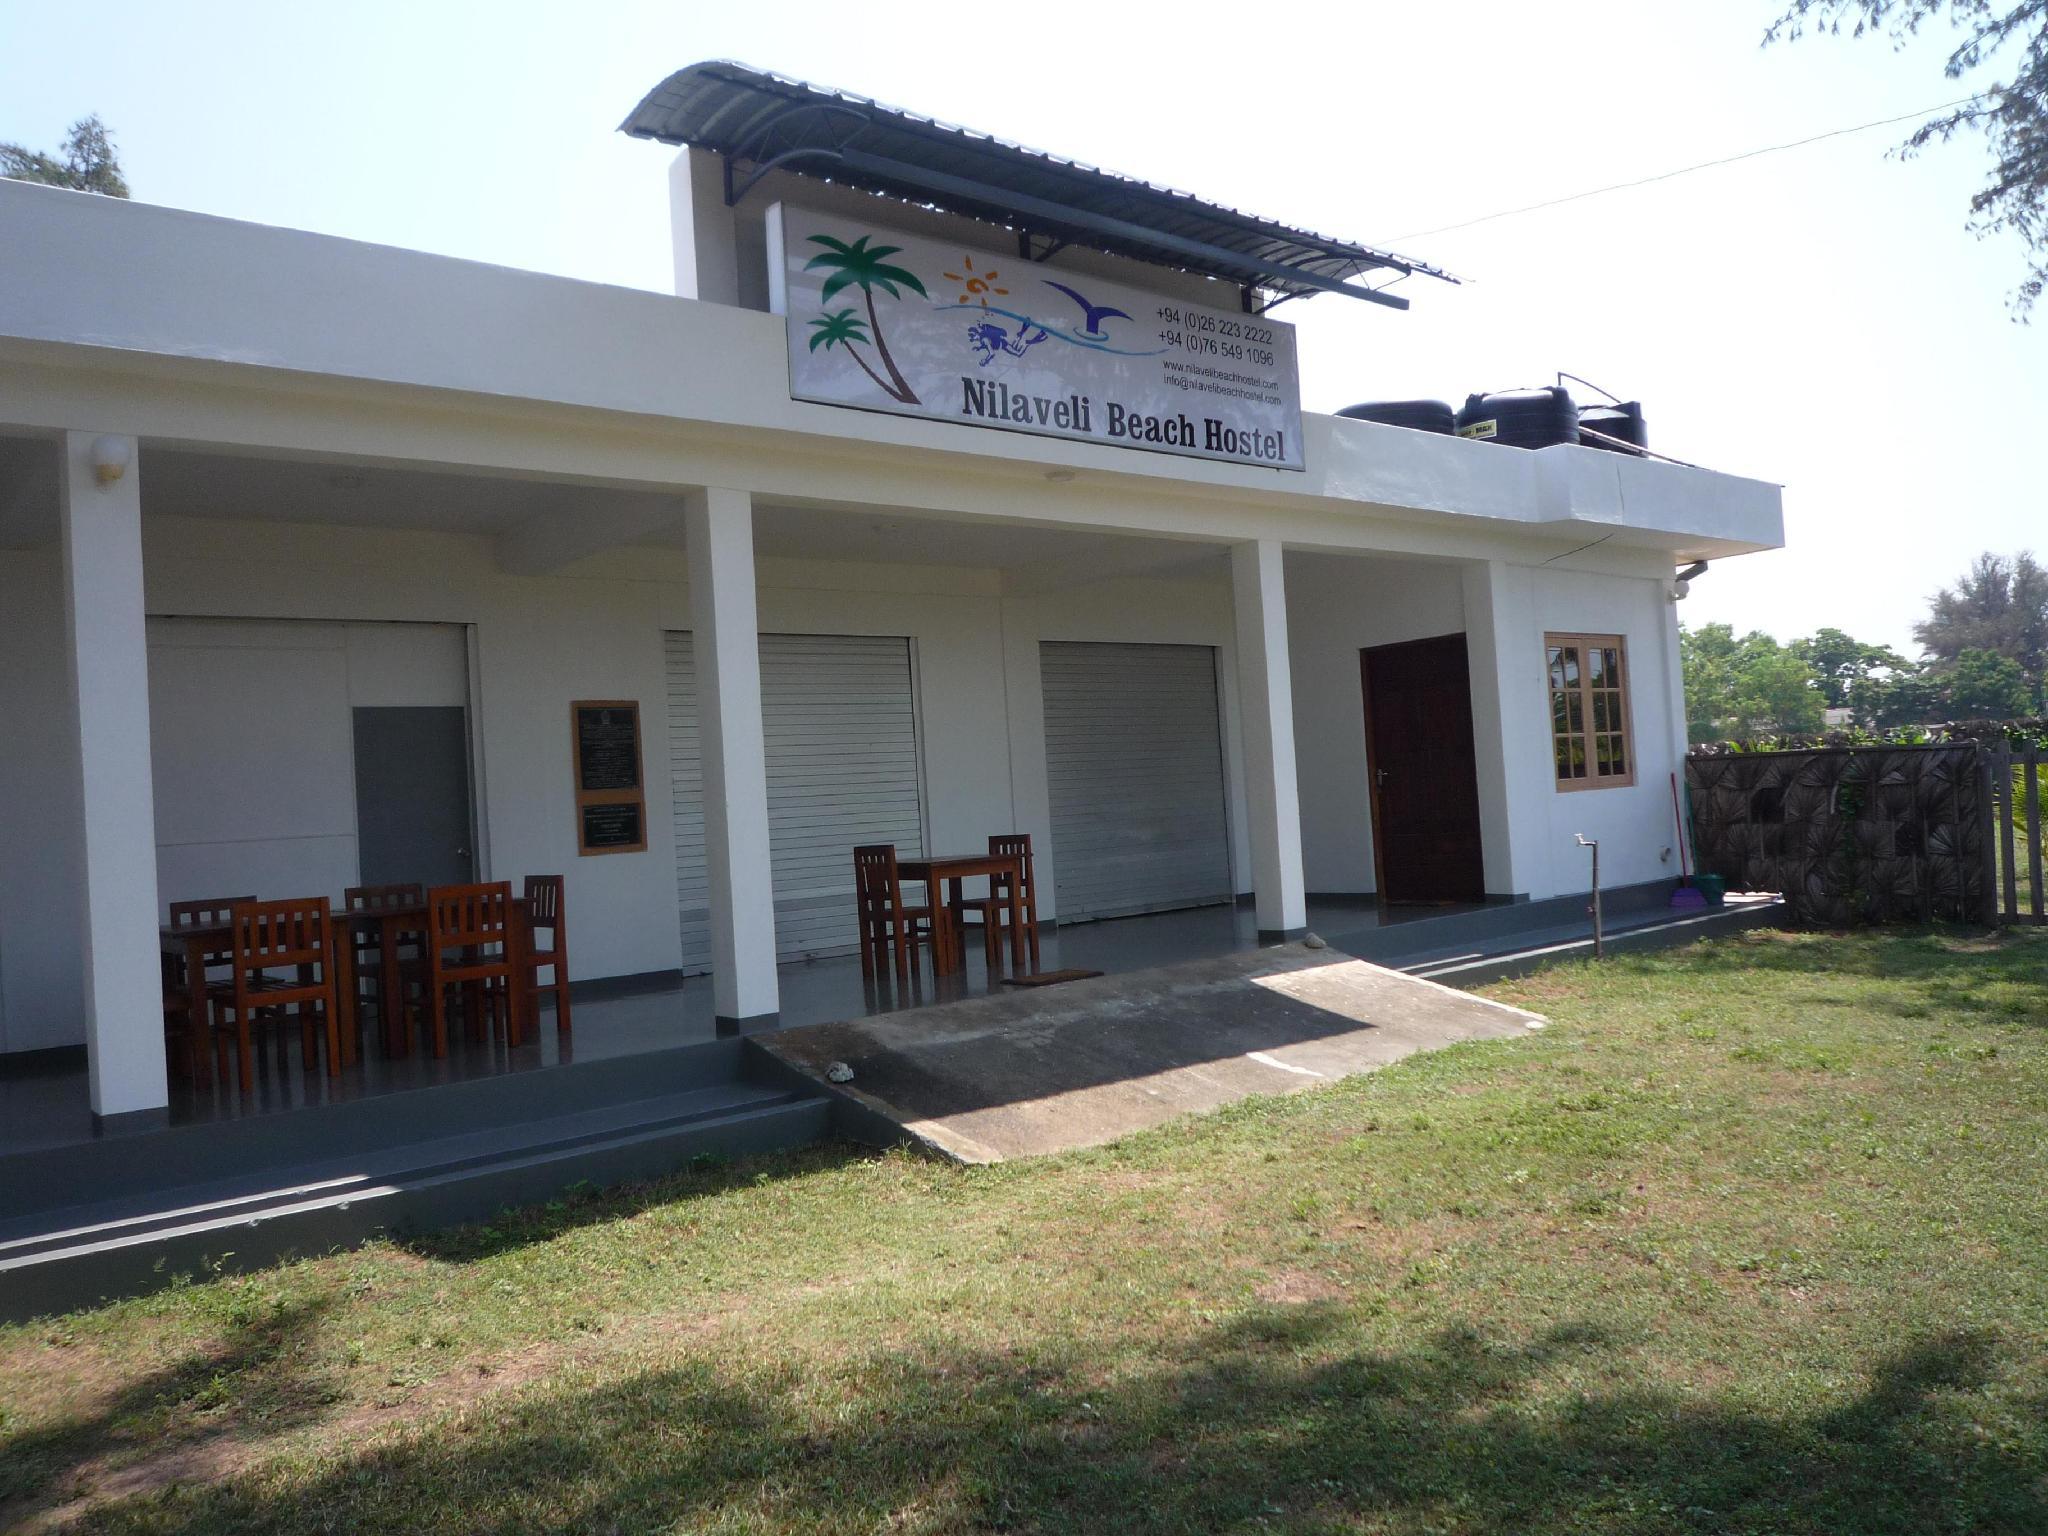 Nilaveli Beach Hostel - Hotels and Accommodation in Sri Lanka, Asia